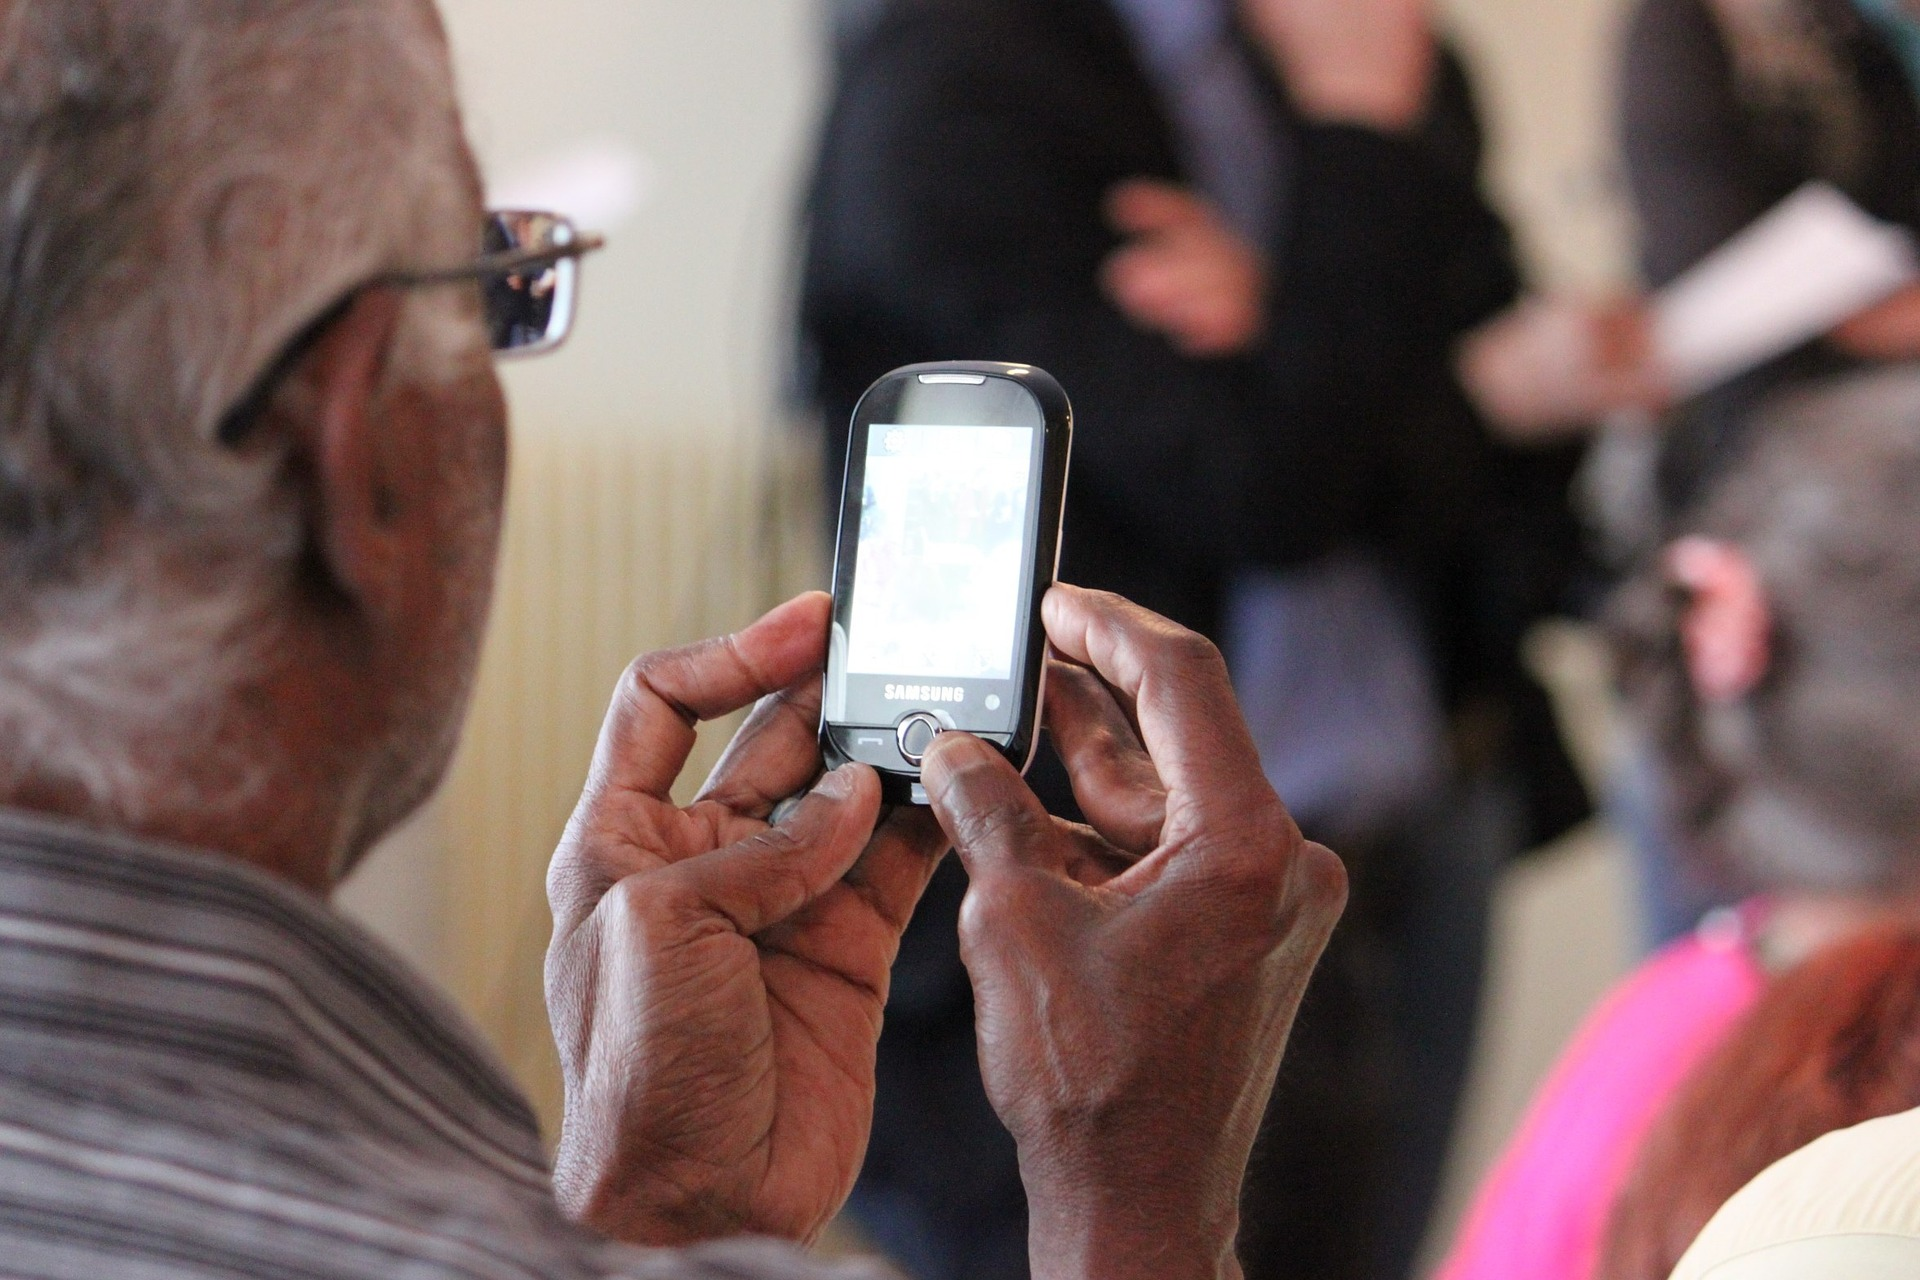 persona mayor usando teléfono móvil